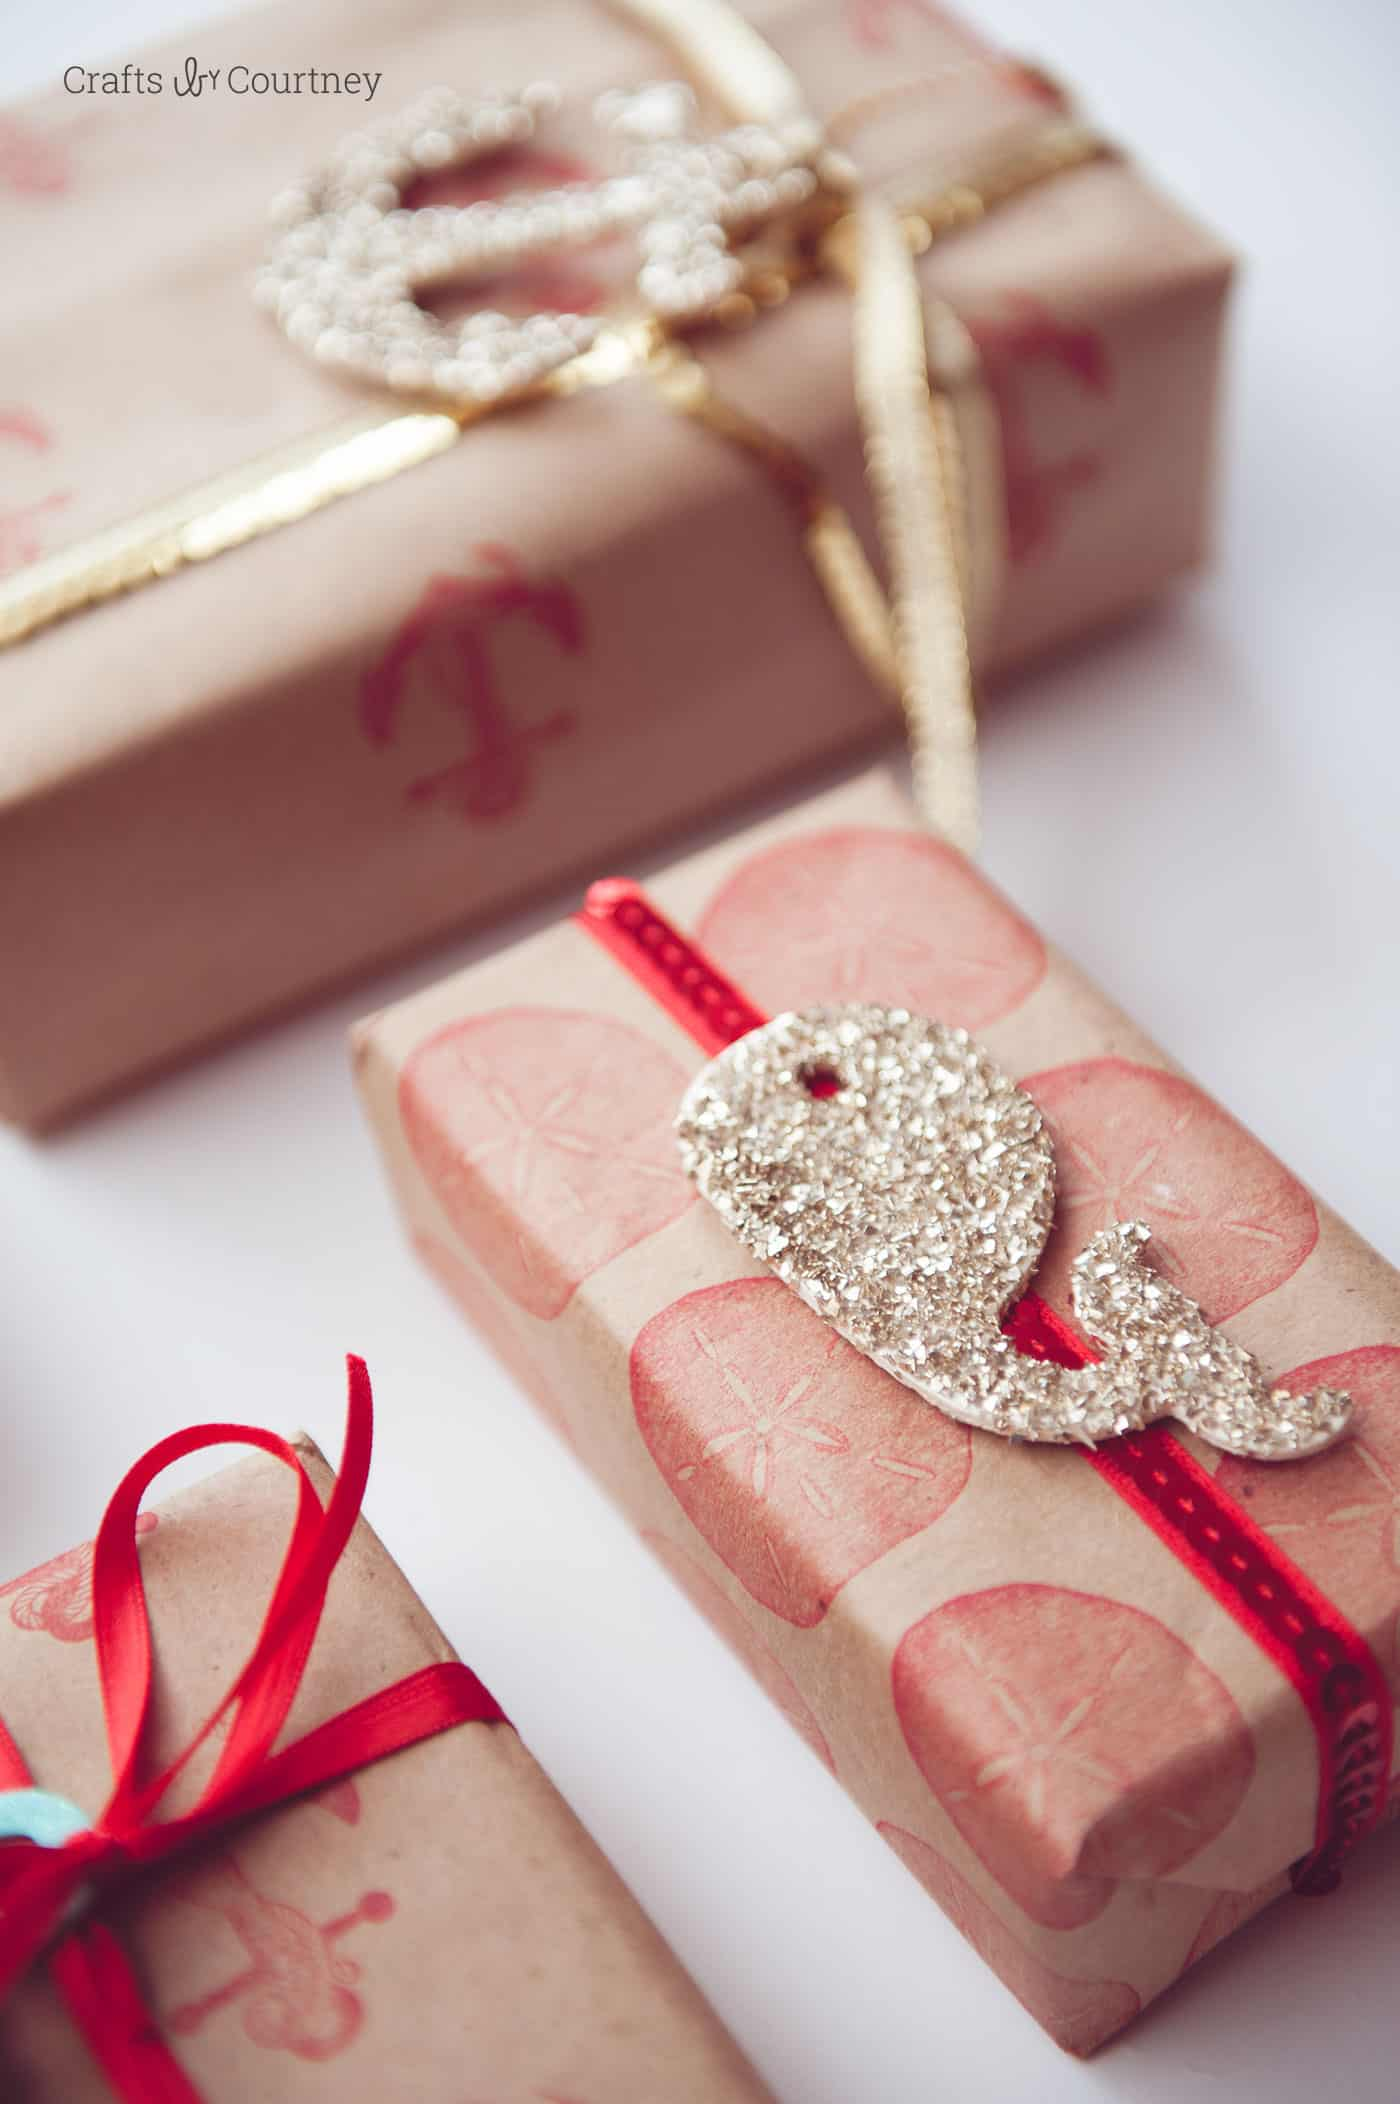 Make DIY Christmas wrapping paper